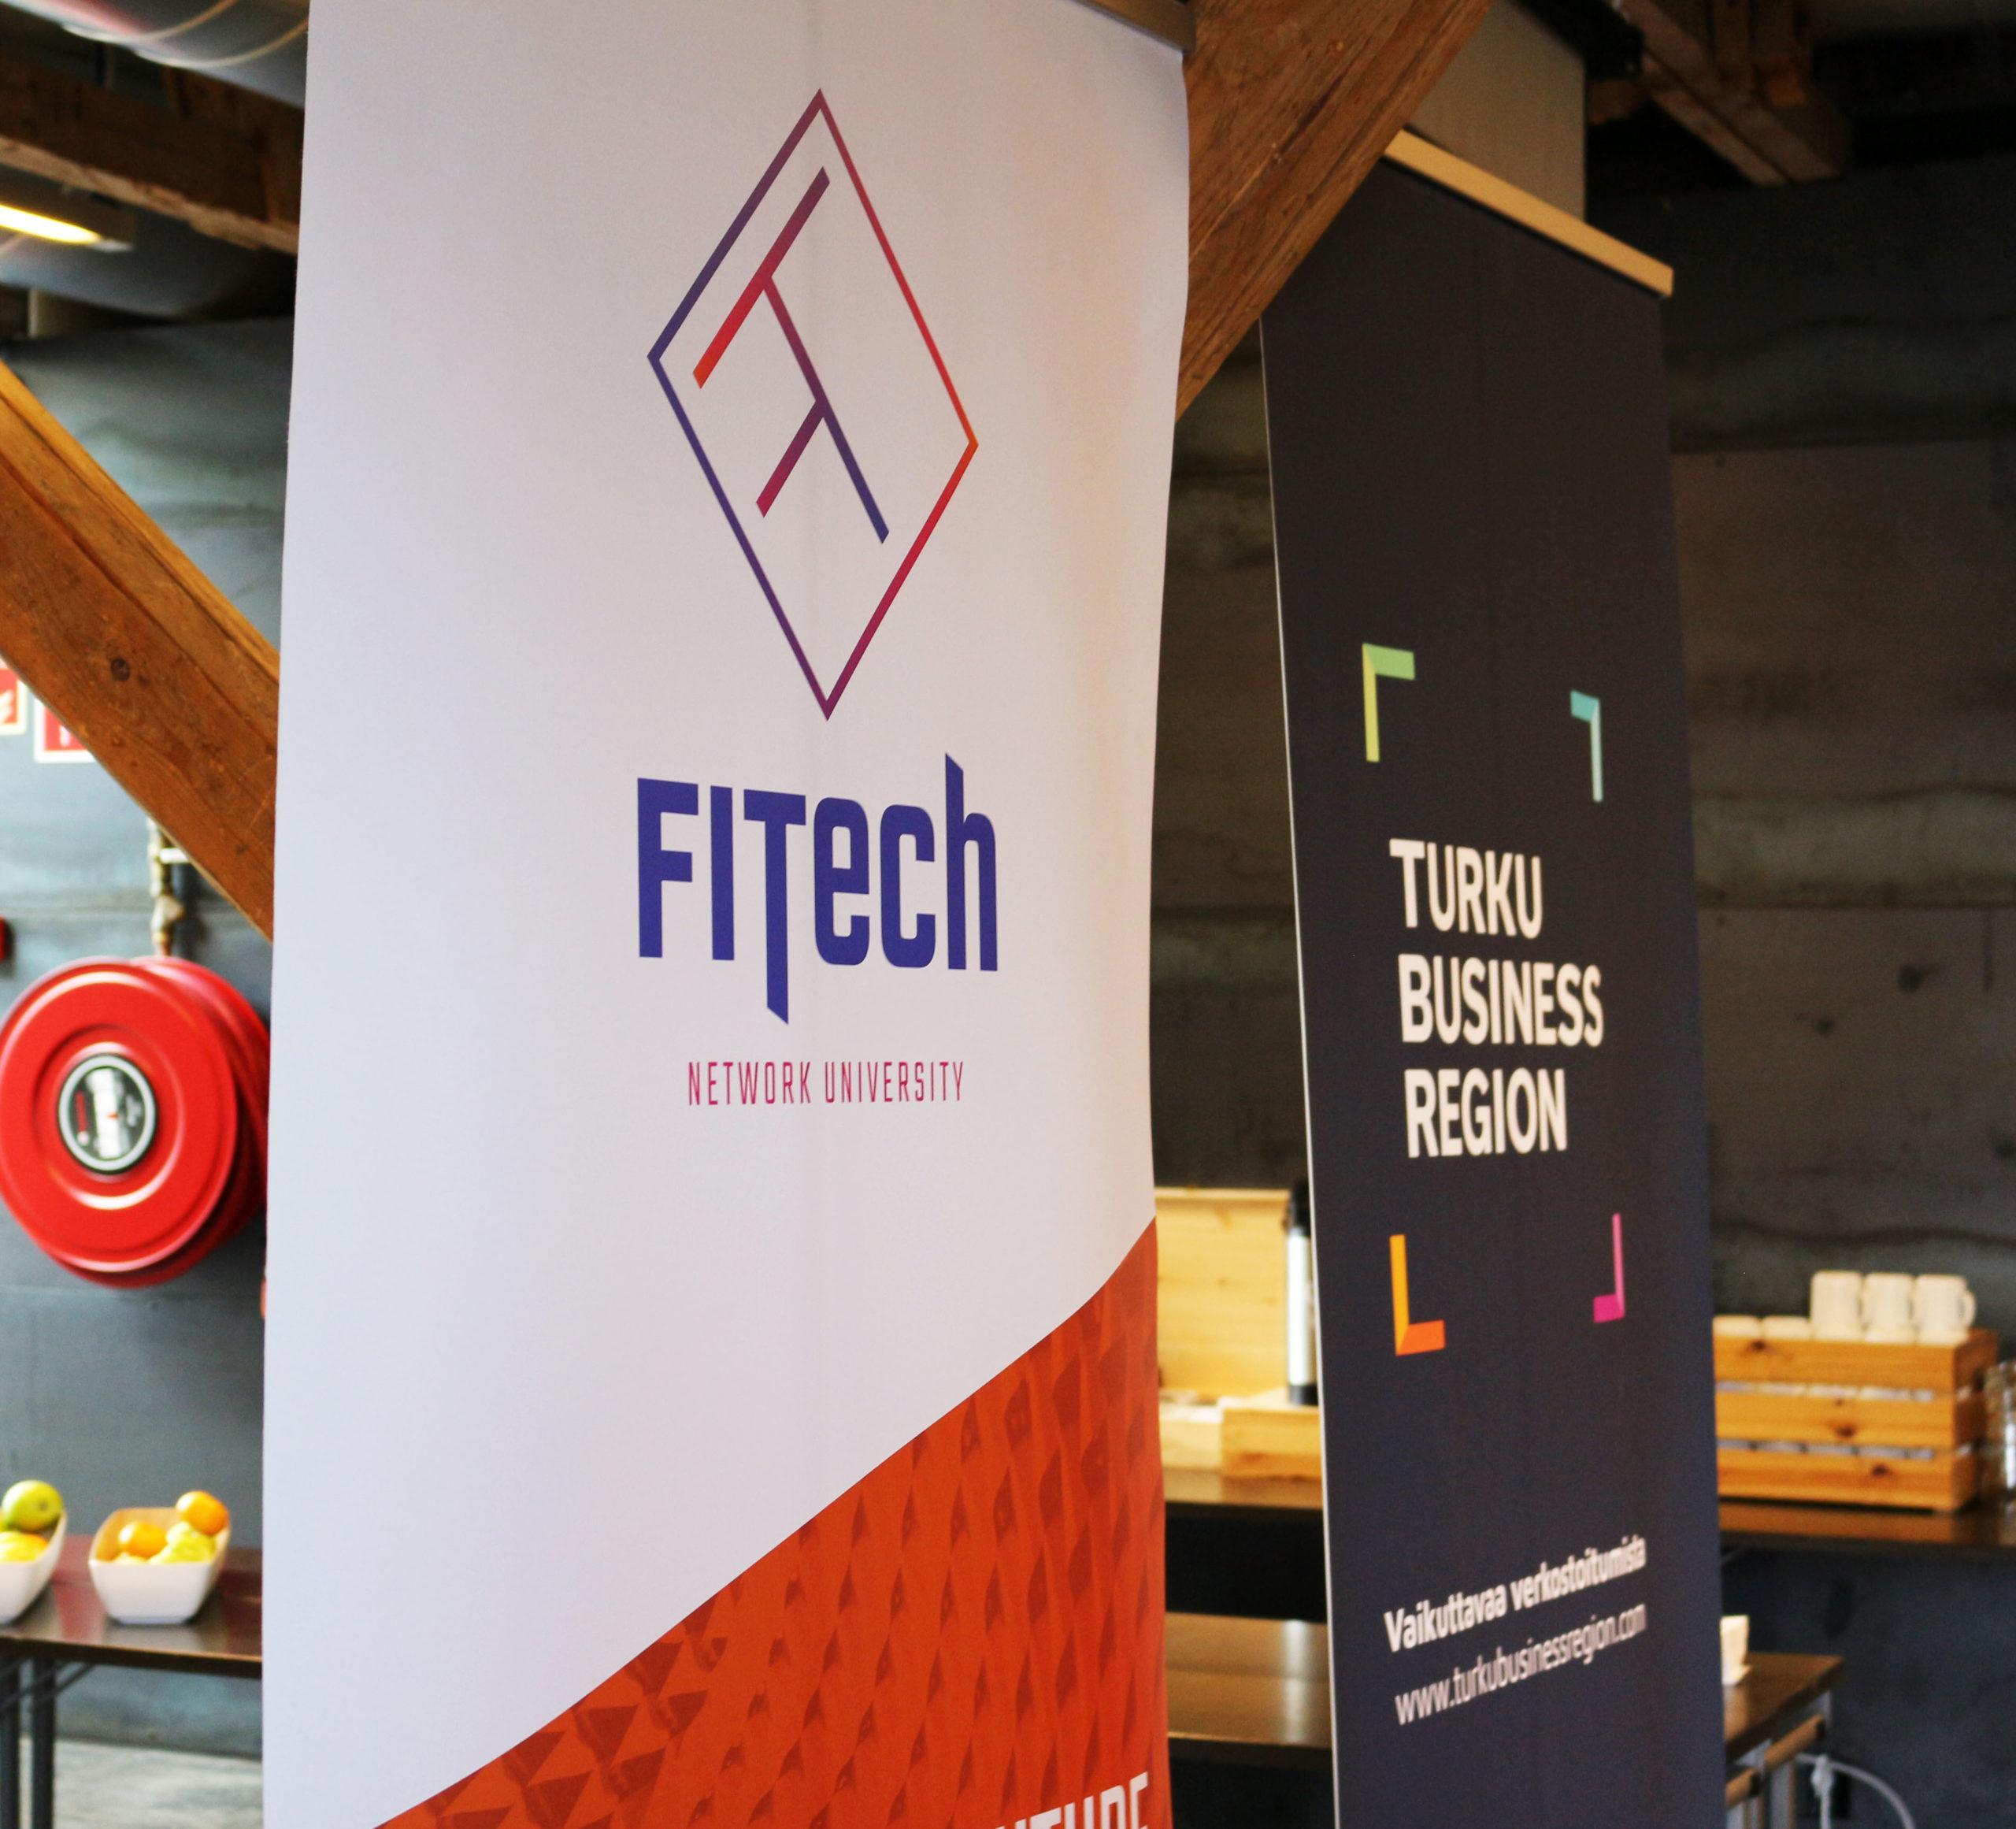 FITechin ja Turku Business Regionin roll-upit vierekkäin.